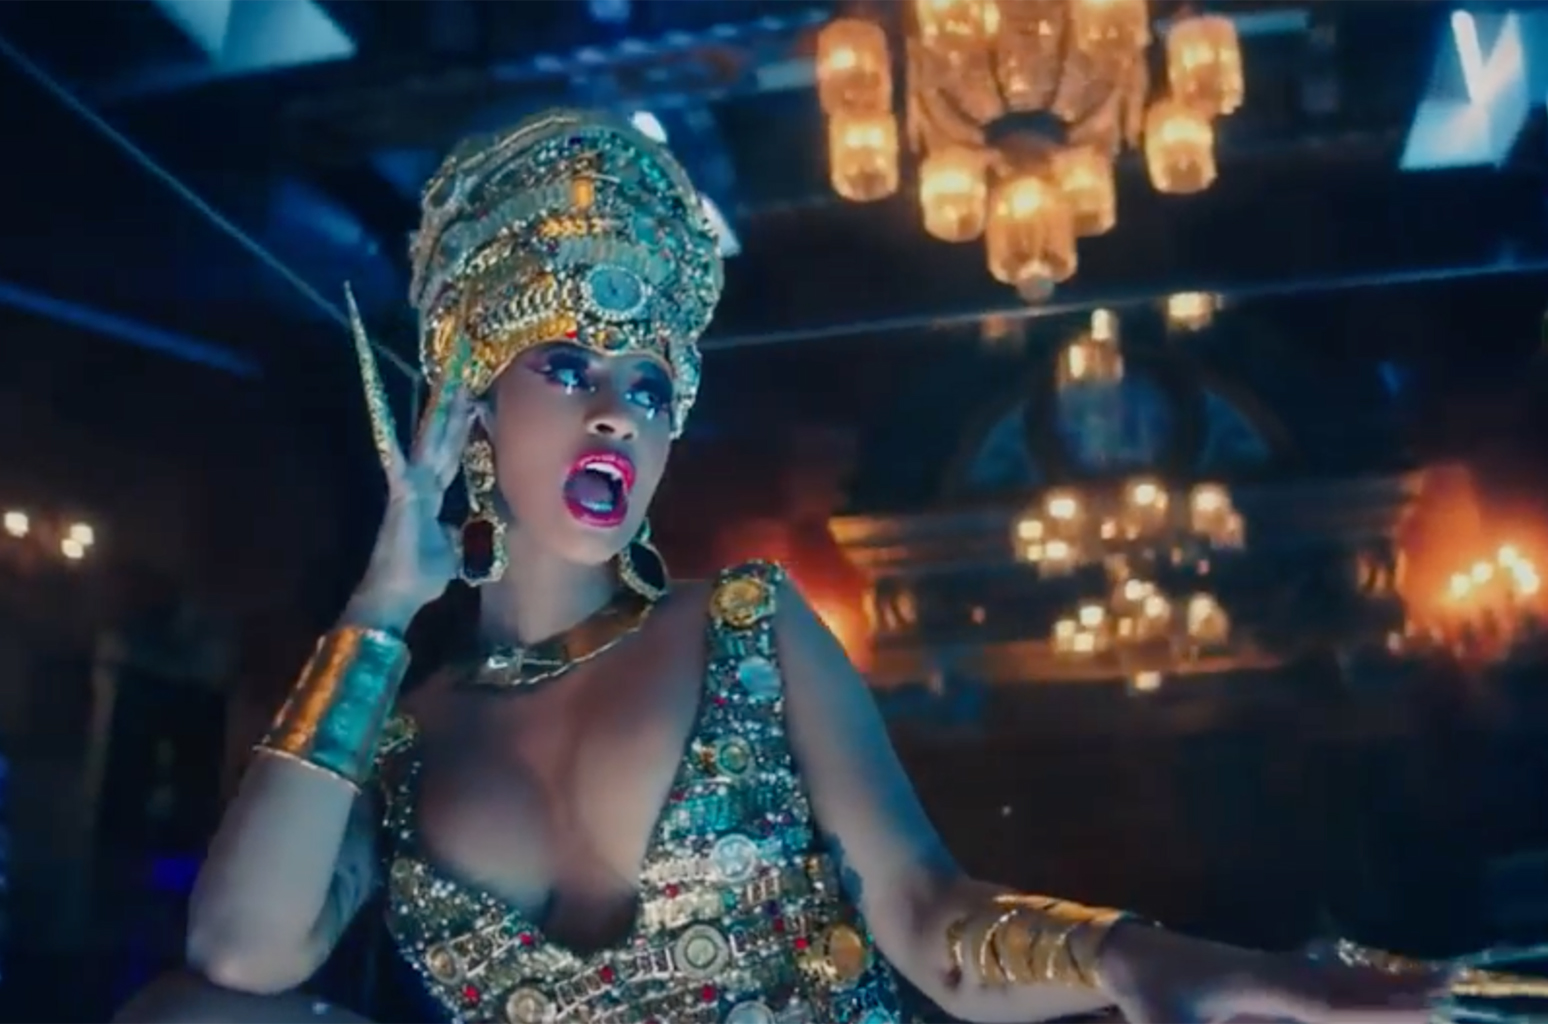 Cardi B Money: Cardi B Unleashes 'Money' Music Video: Watch